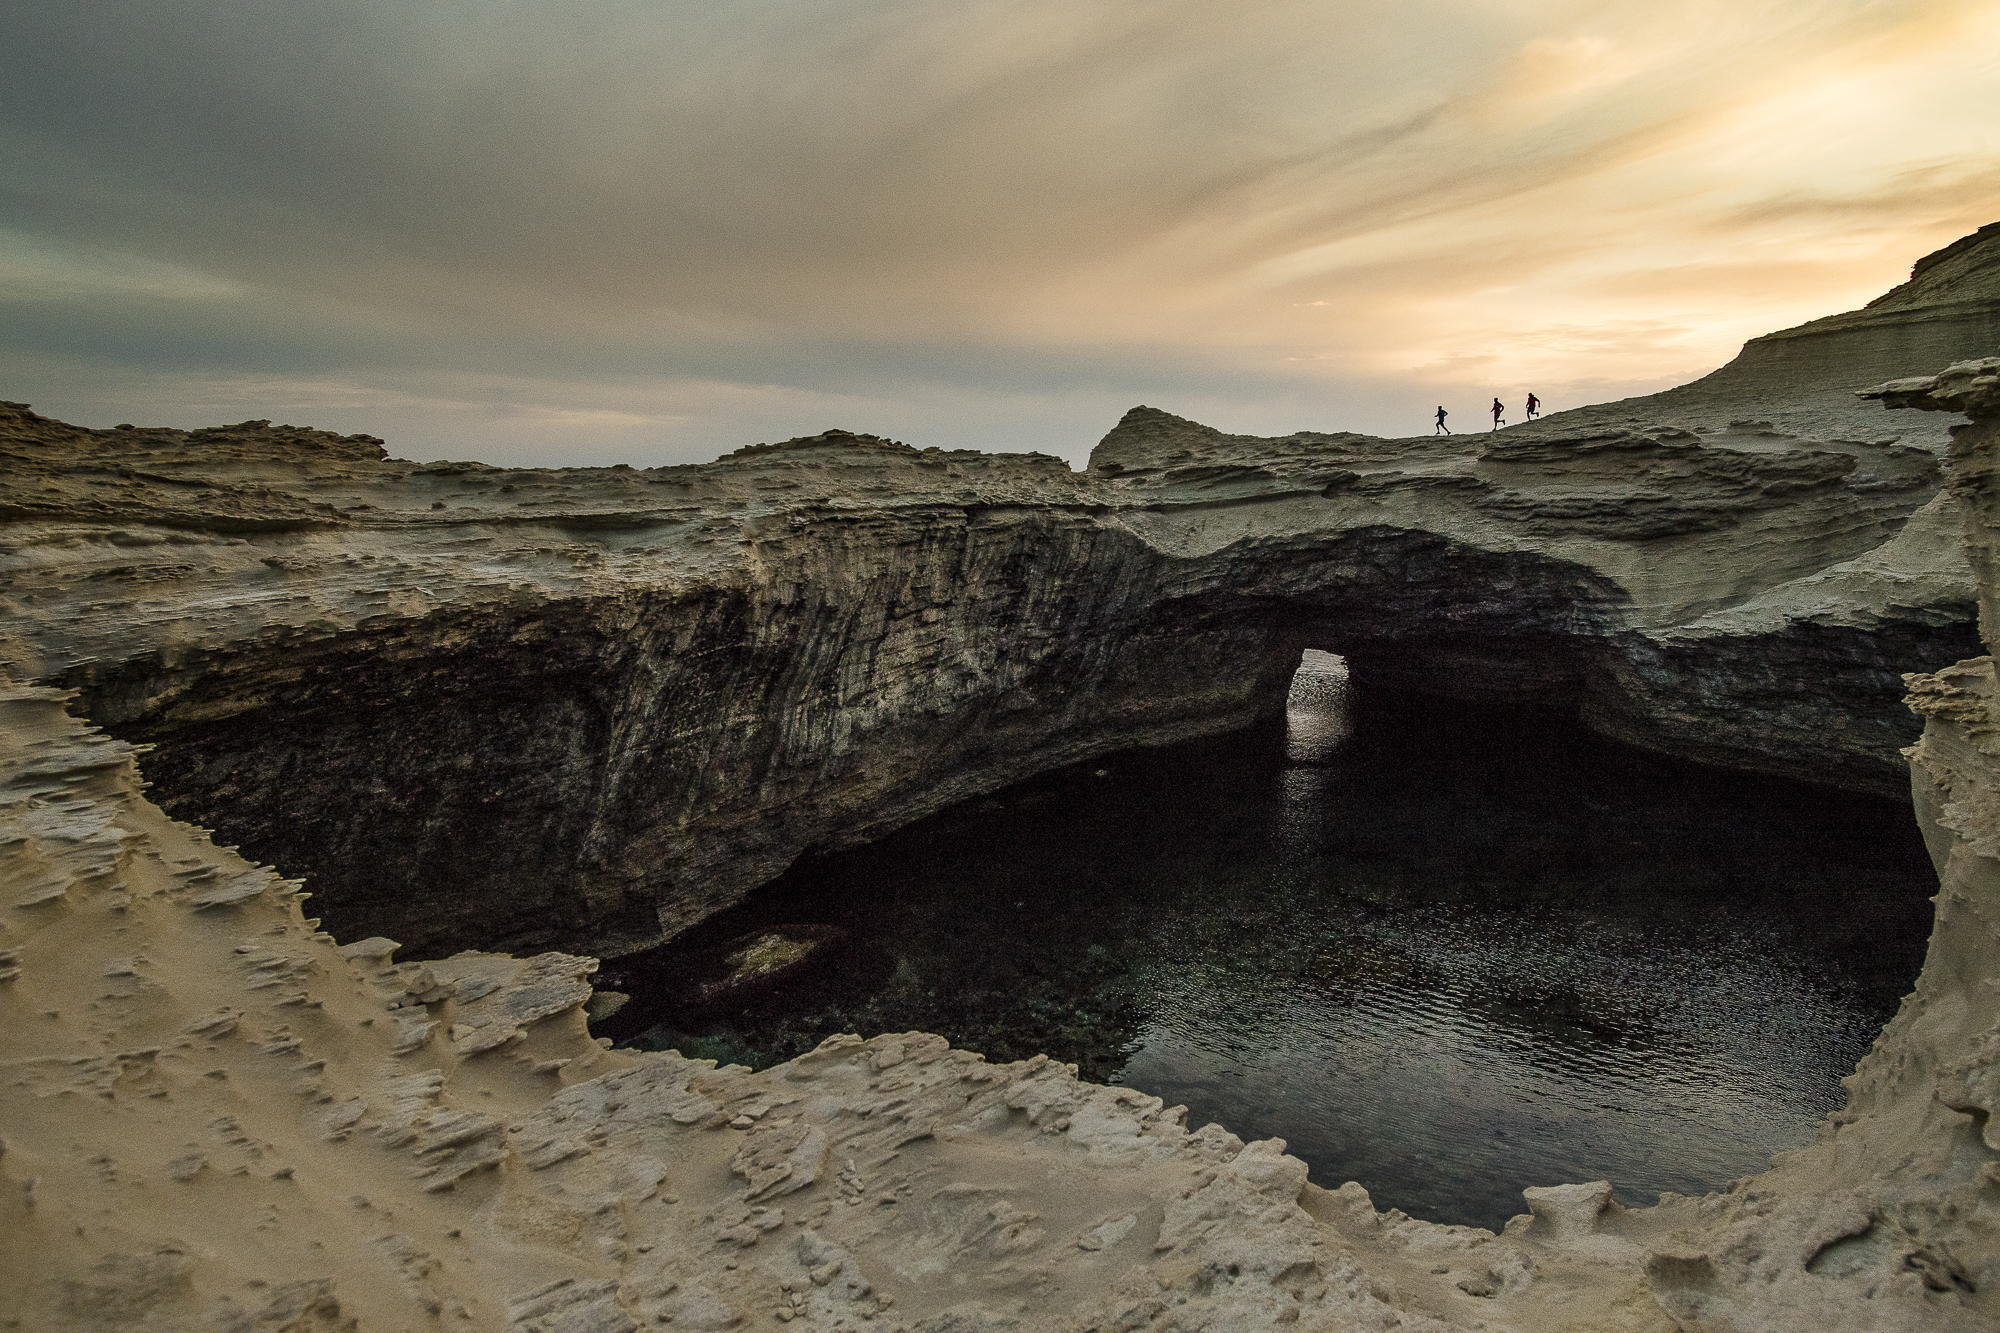 Capu Pertusato au coucher du soleil, Corse